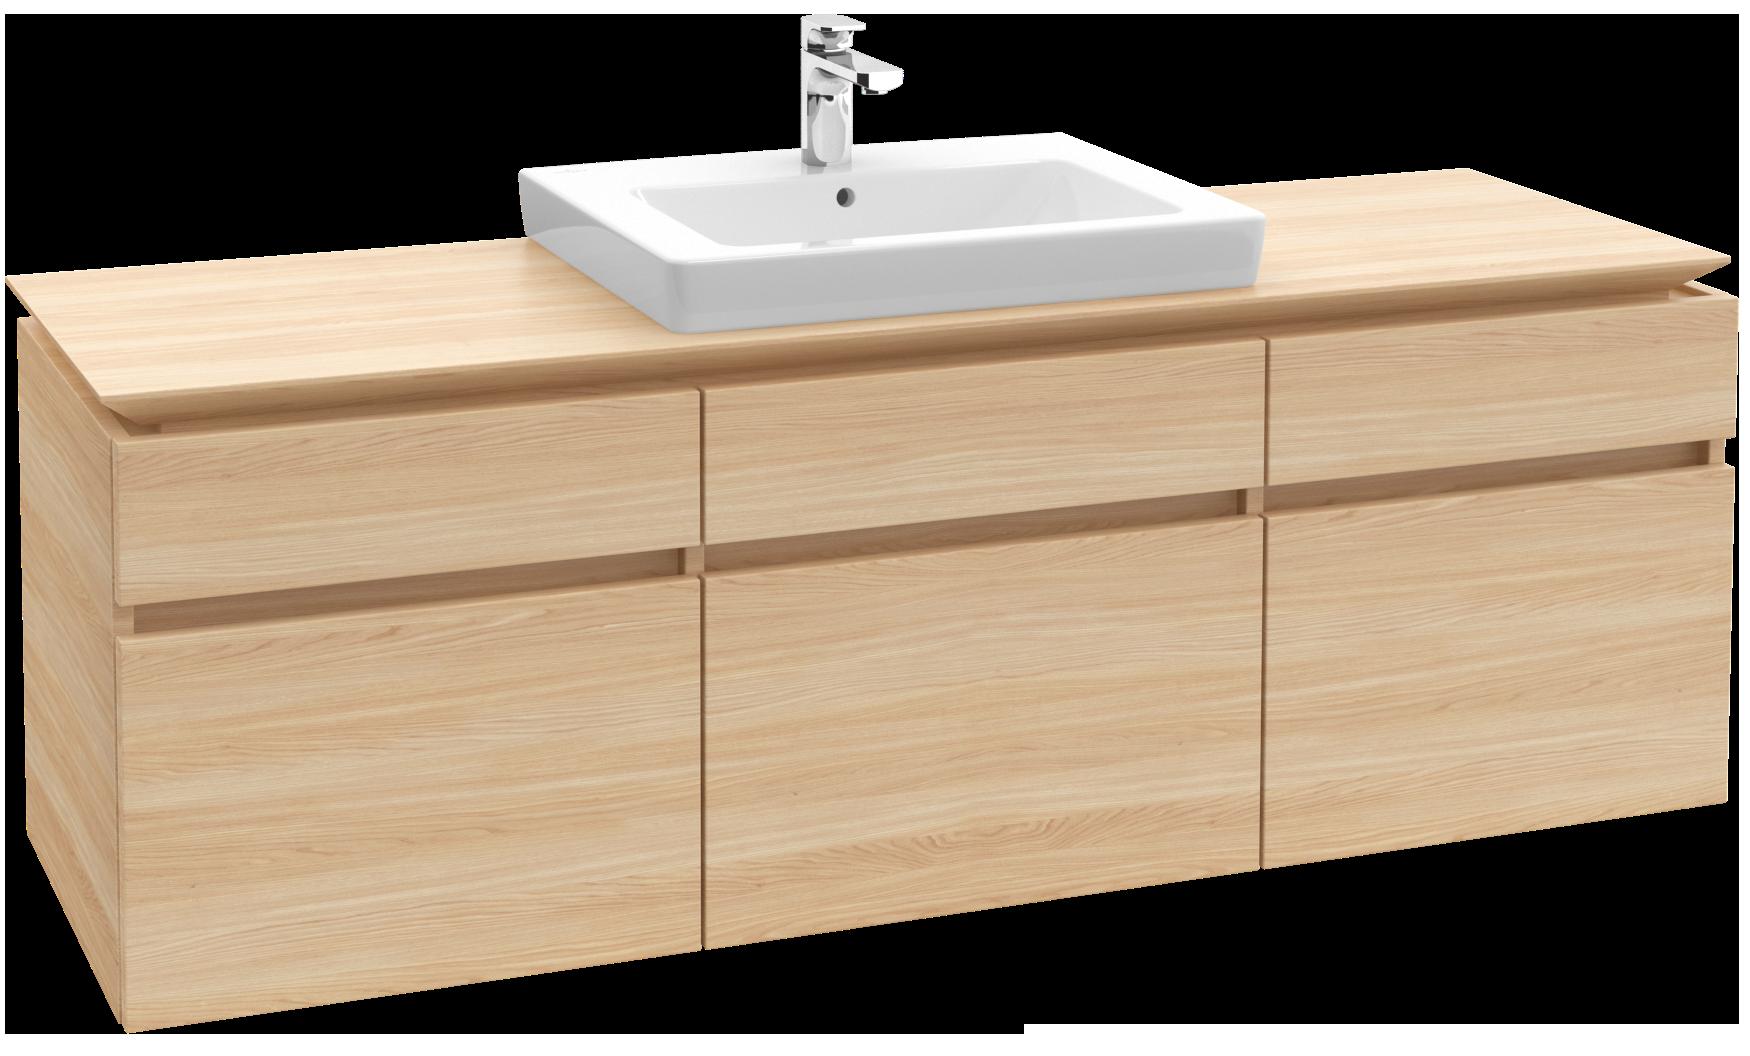 legato meuble sous lavabo b25200 villeroy boch. Black Bedroom Furniture Sets. Home Design Ideas